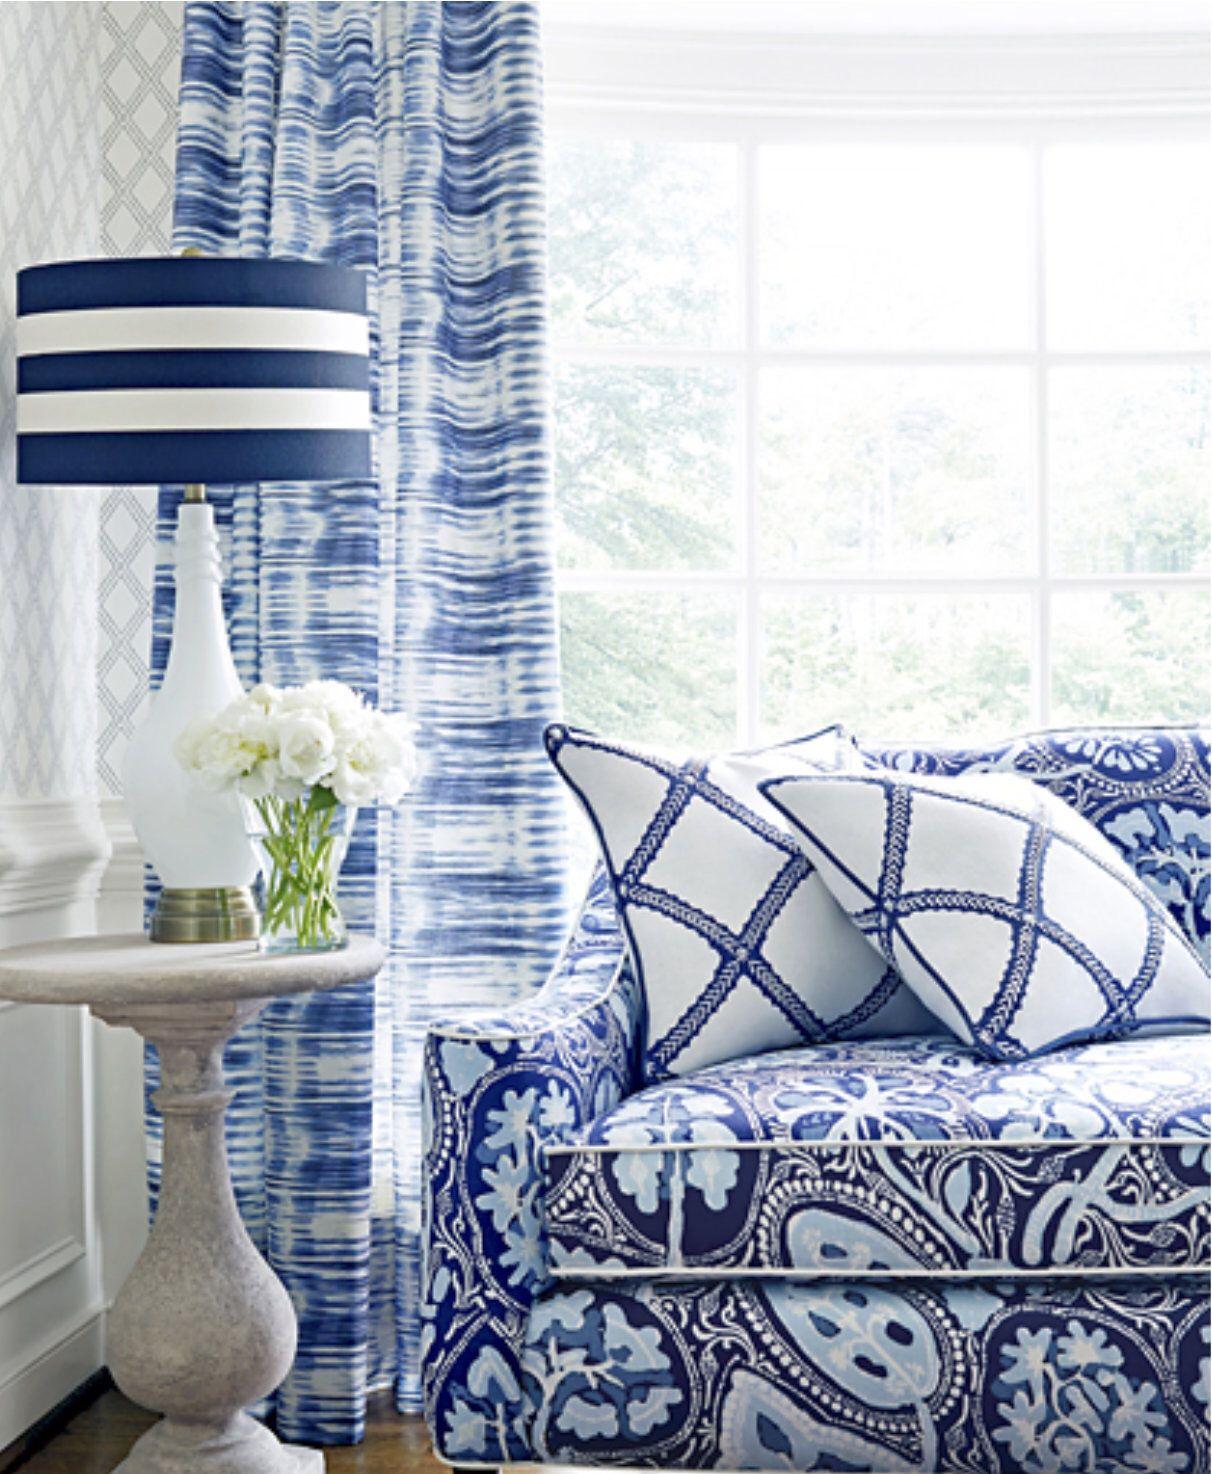 Blue Ikat Curtains Thibaut Charcoal Curtain Panels And White D Shibori Gray